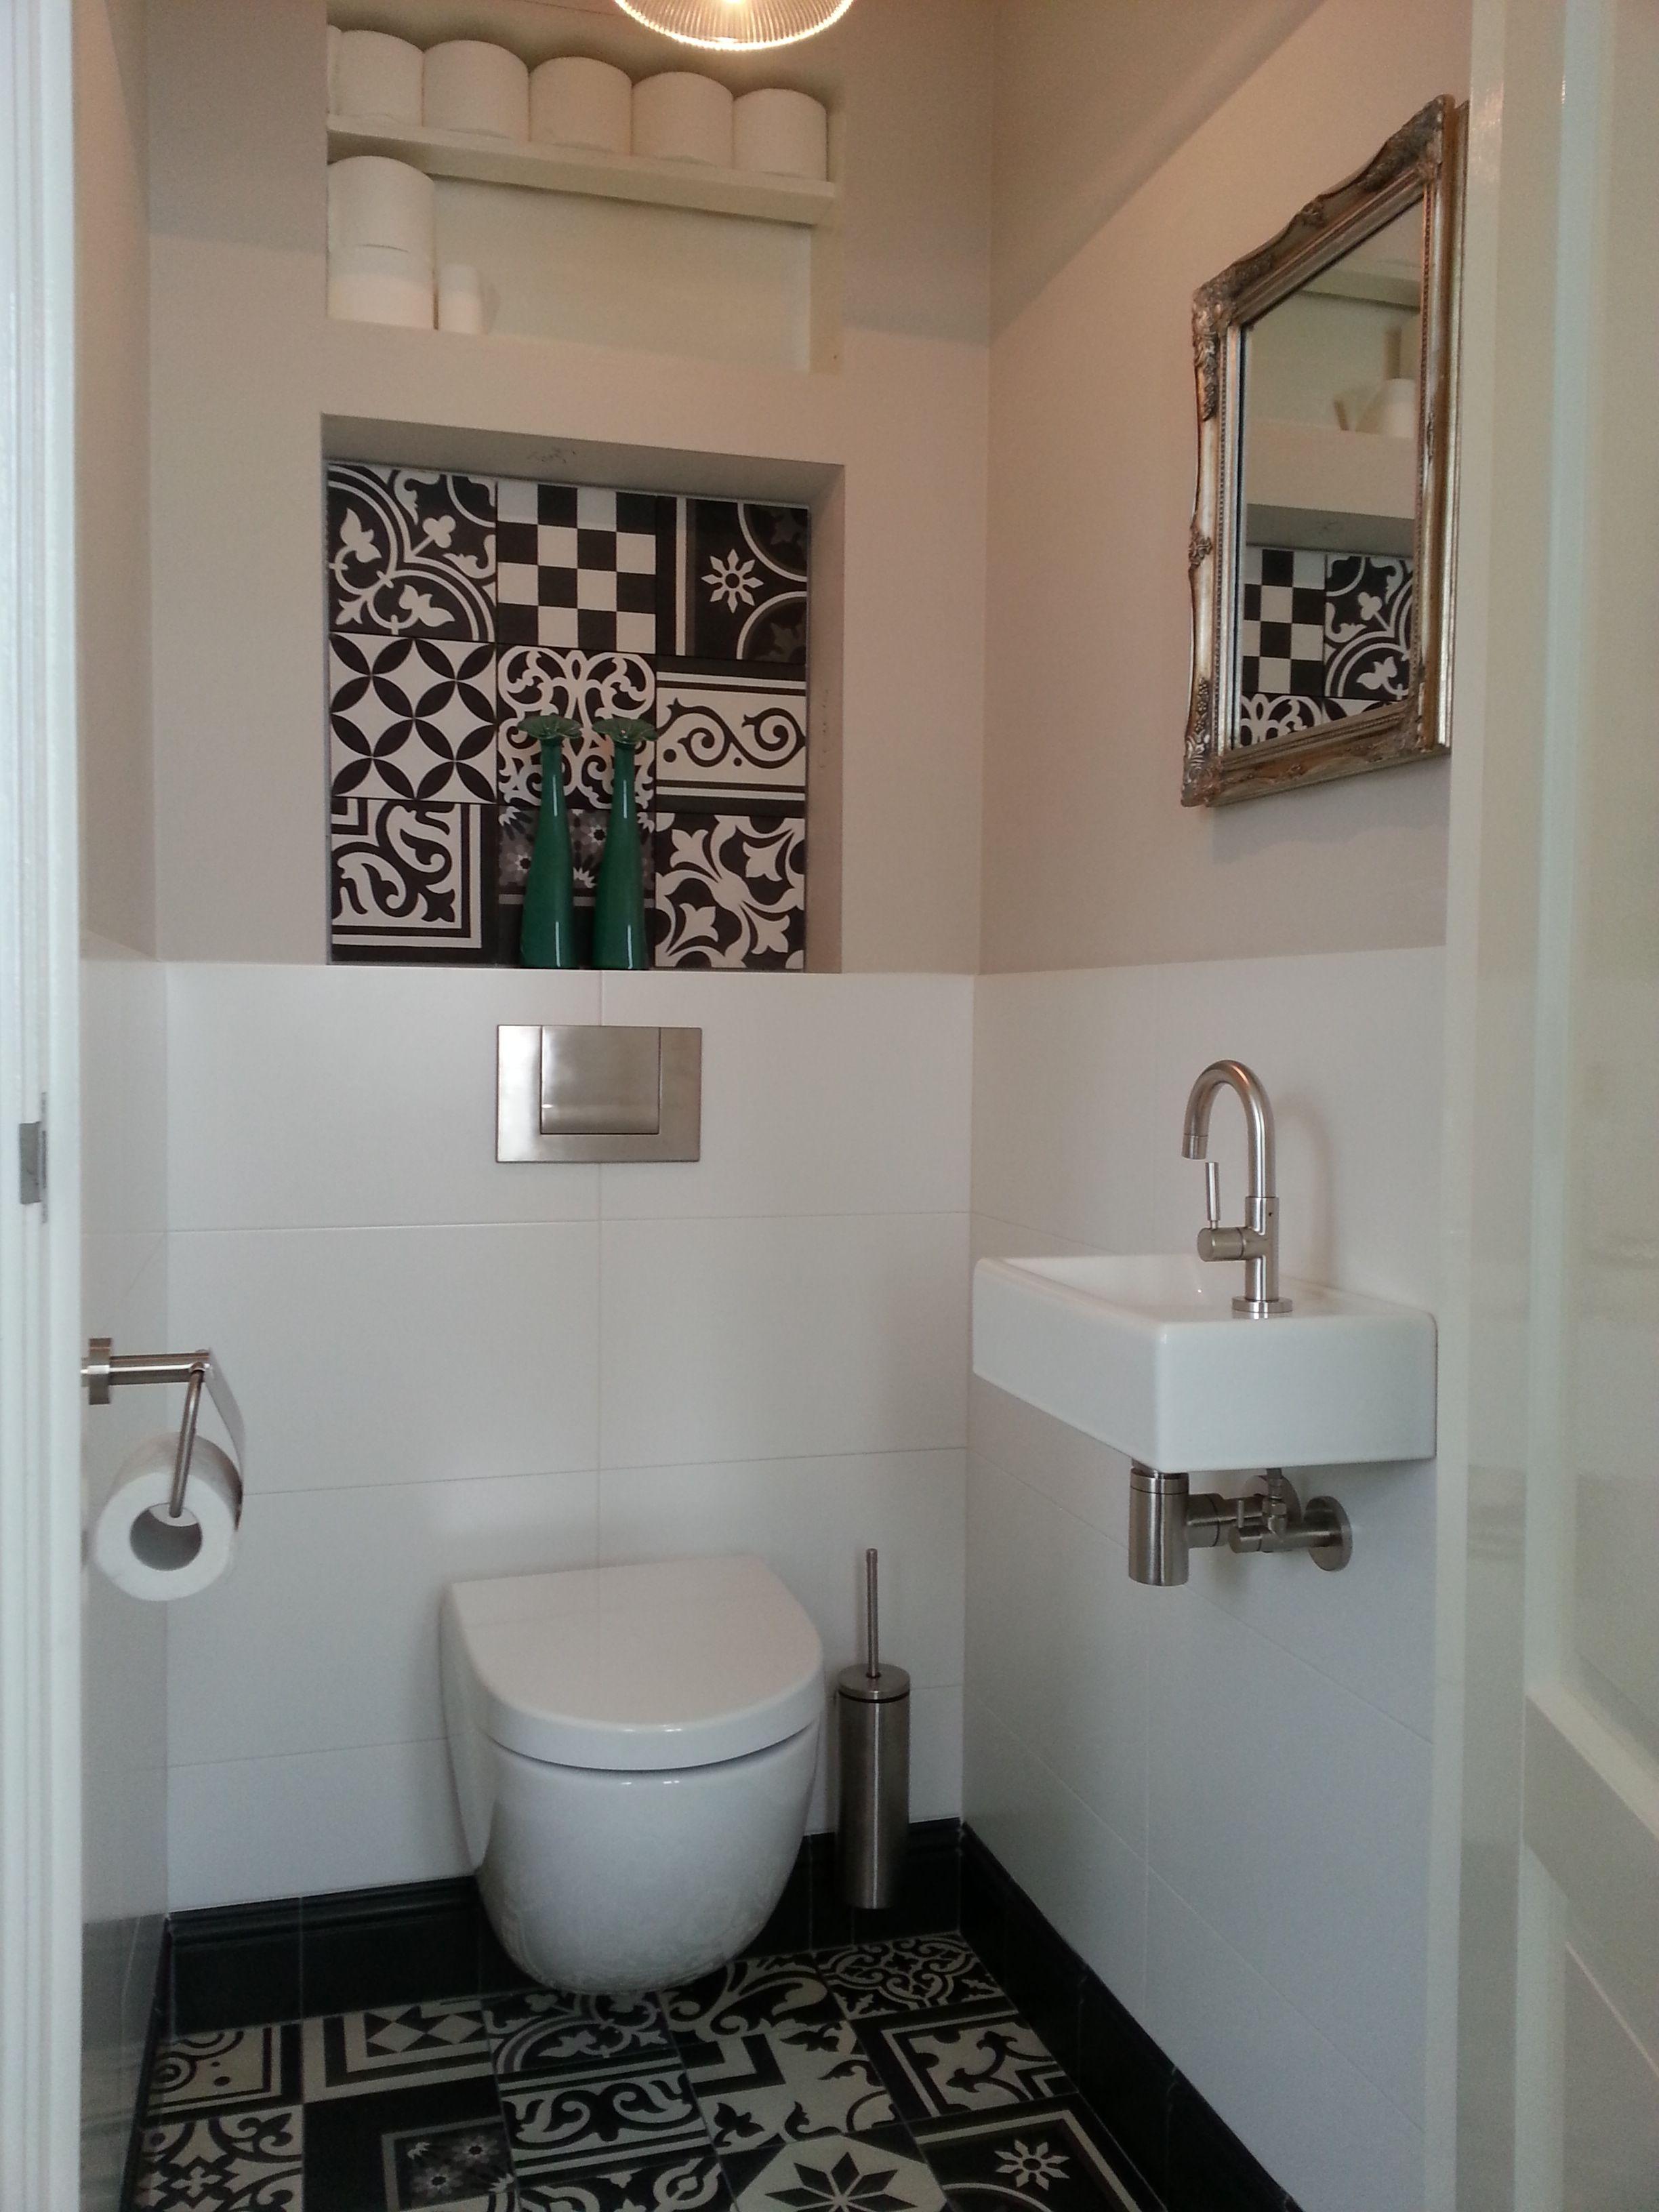 Gäste Wc Kleiner Raum portugese tegels toilet zoeken wonen gäste